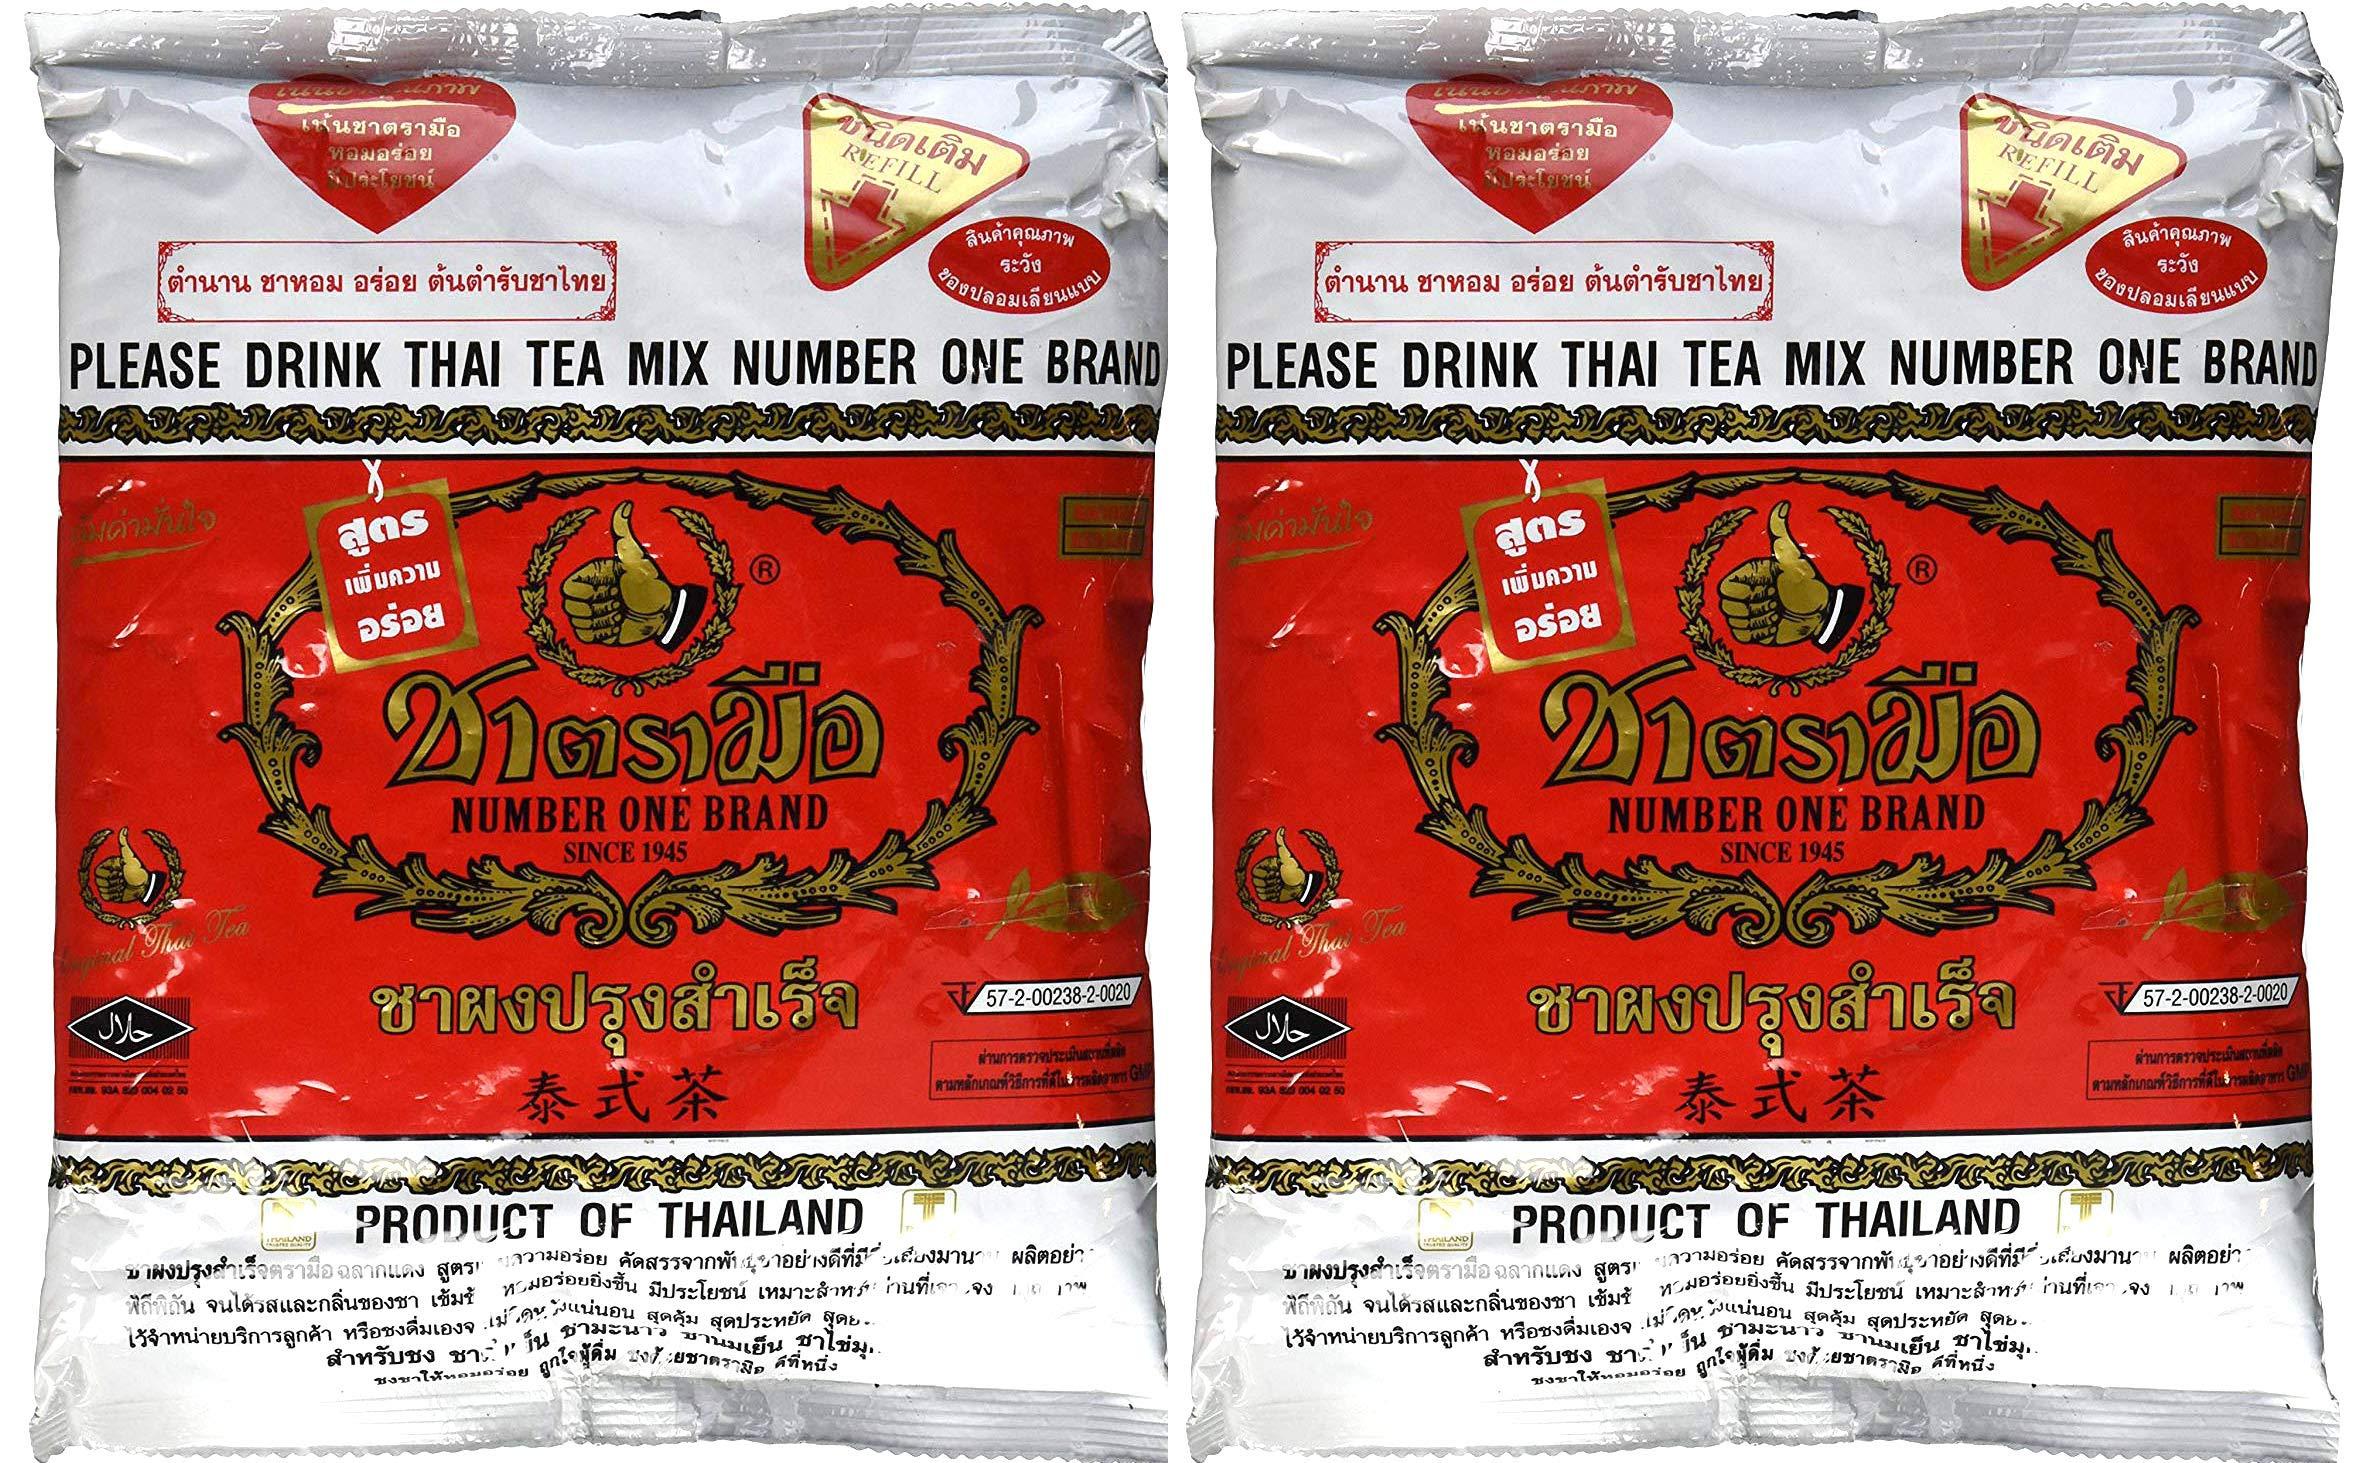 Thai-Tea-Mix-Number-One-Brand-2x400g